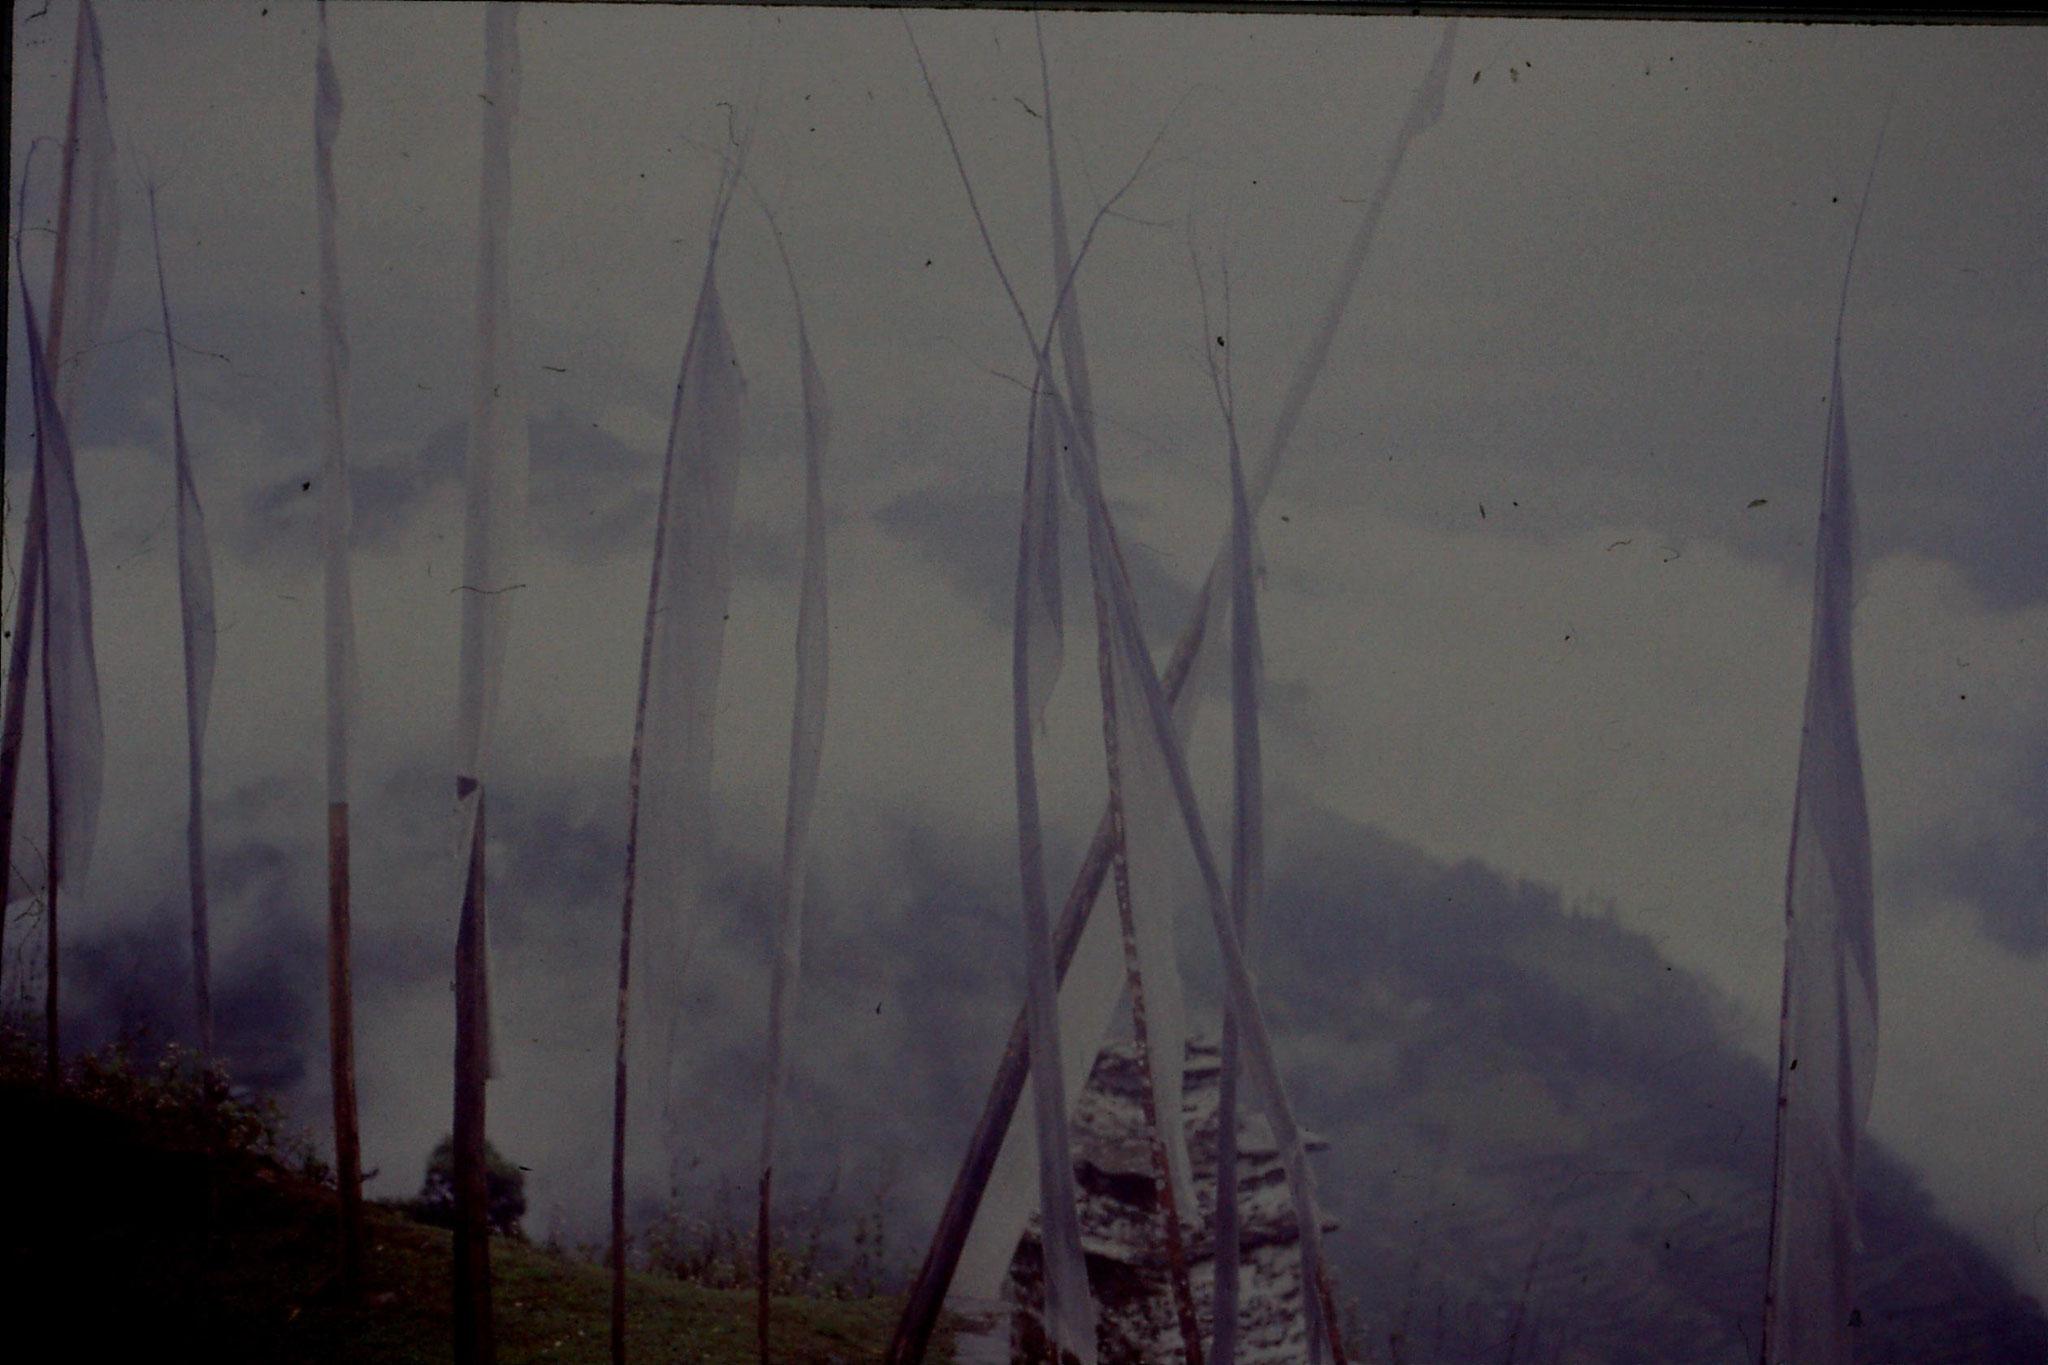 115/26: 27/4/1990 Pelling - Sanga Choling monastery